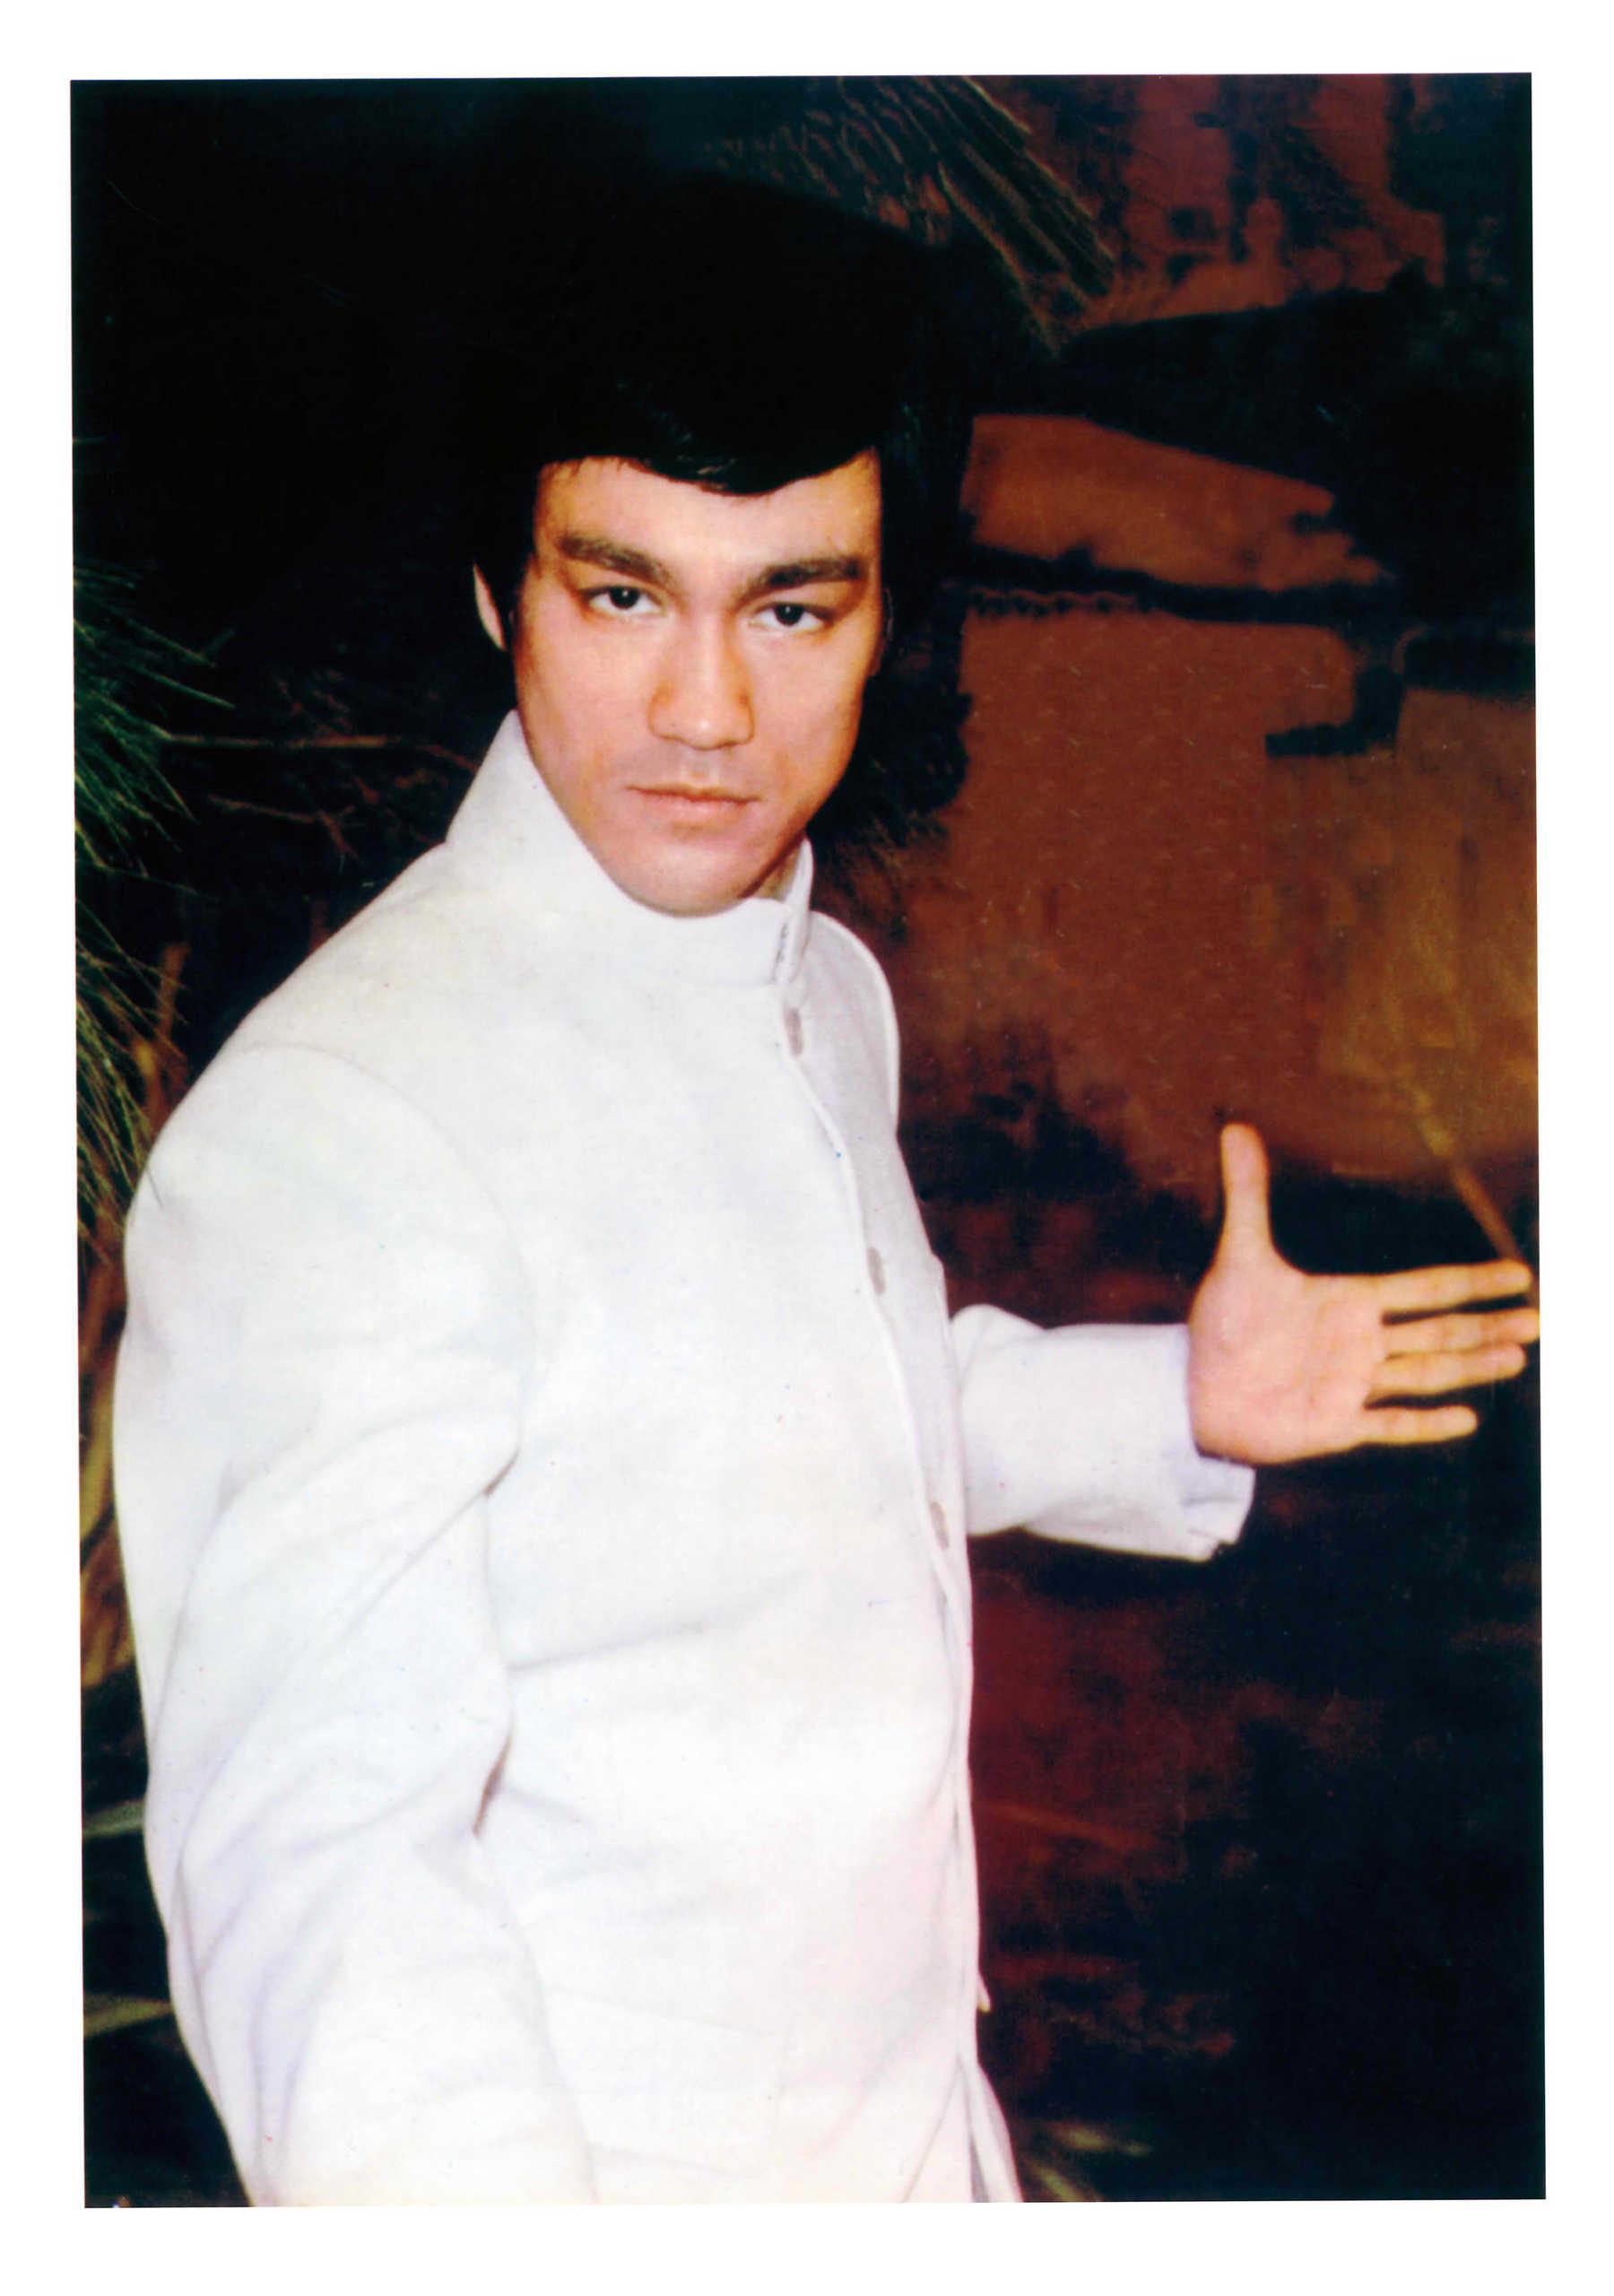 Bruce Lee Wallpaper Gallery Image Digital Hot